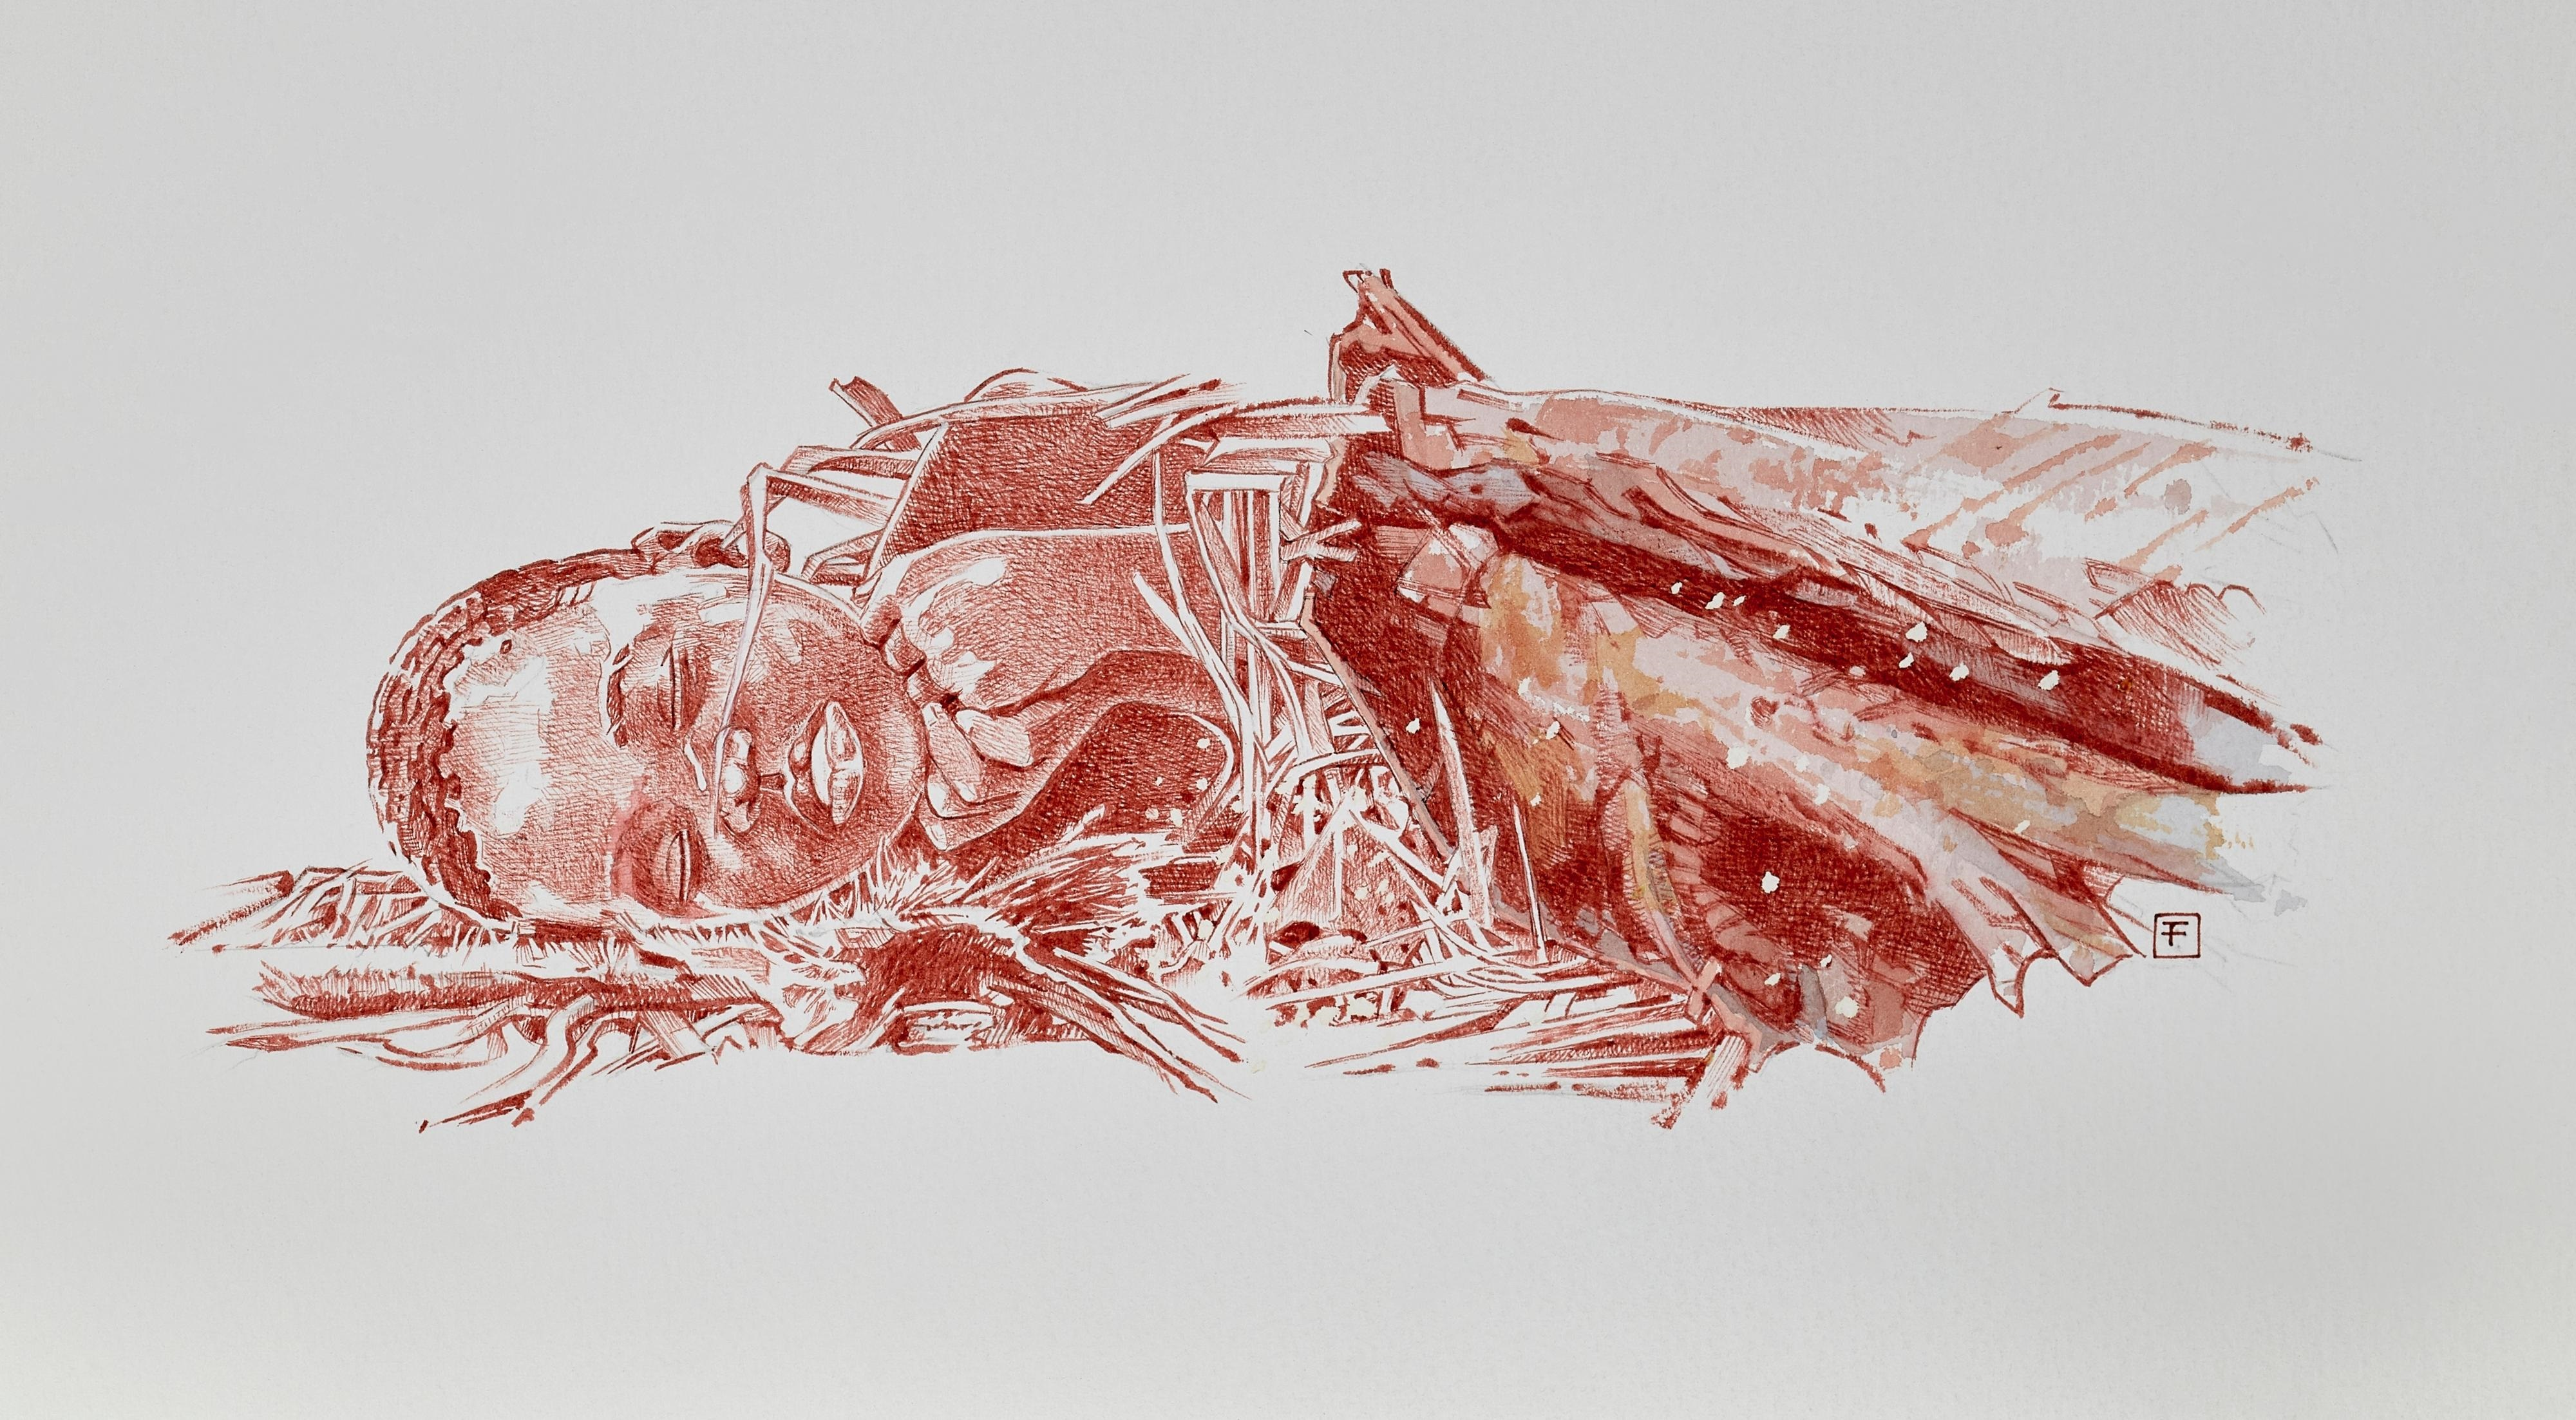 An artist's interpretation of Mtoto's burial